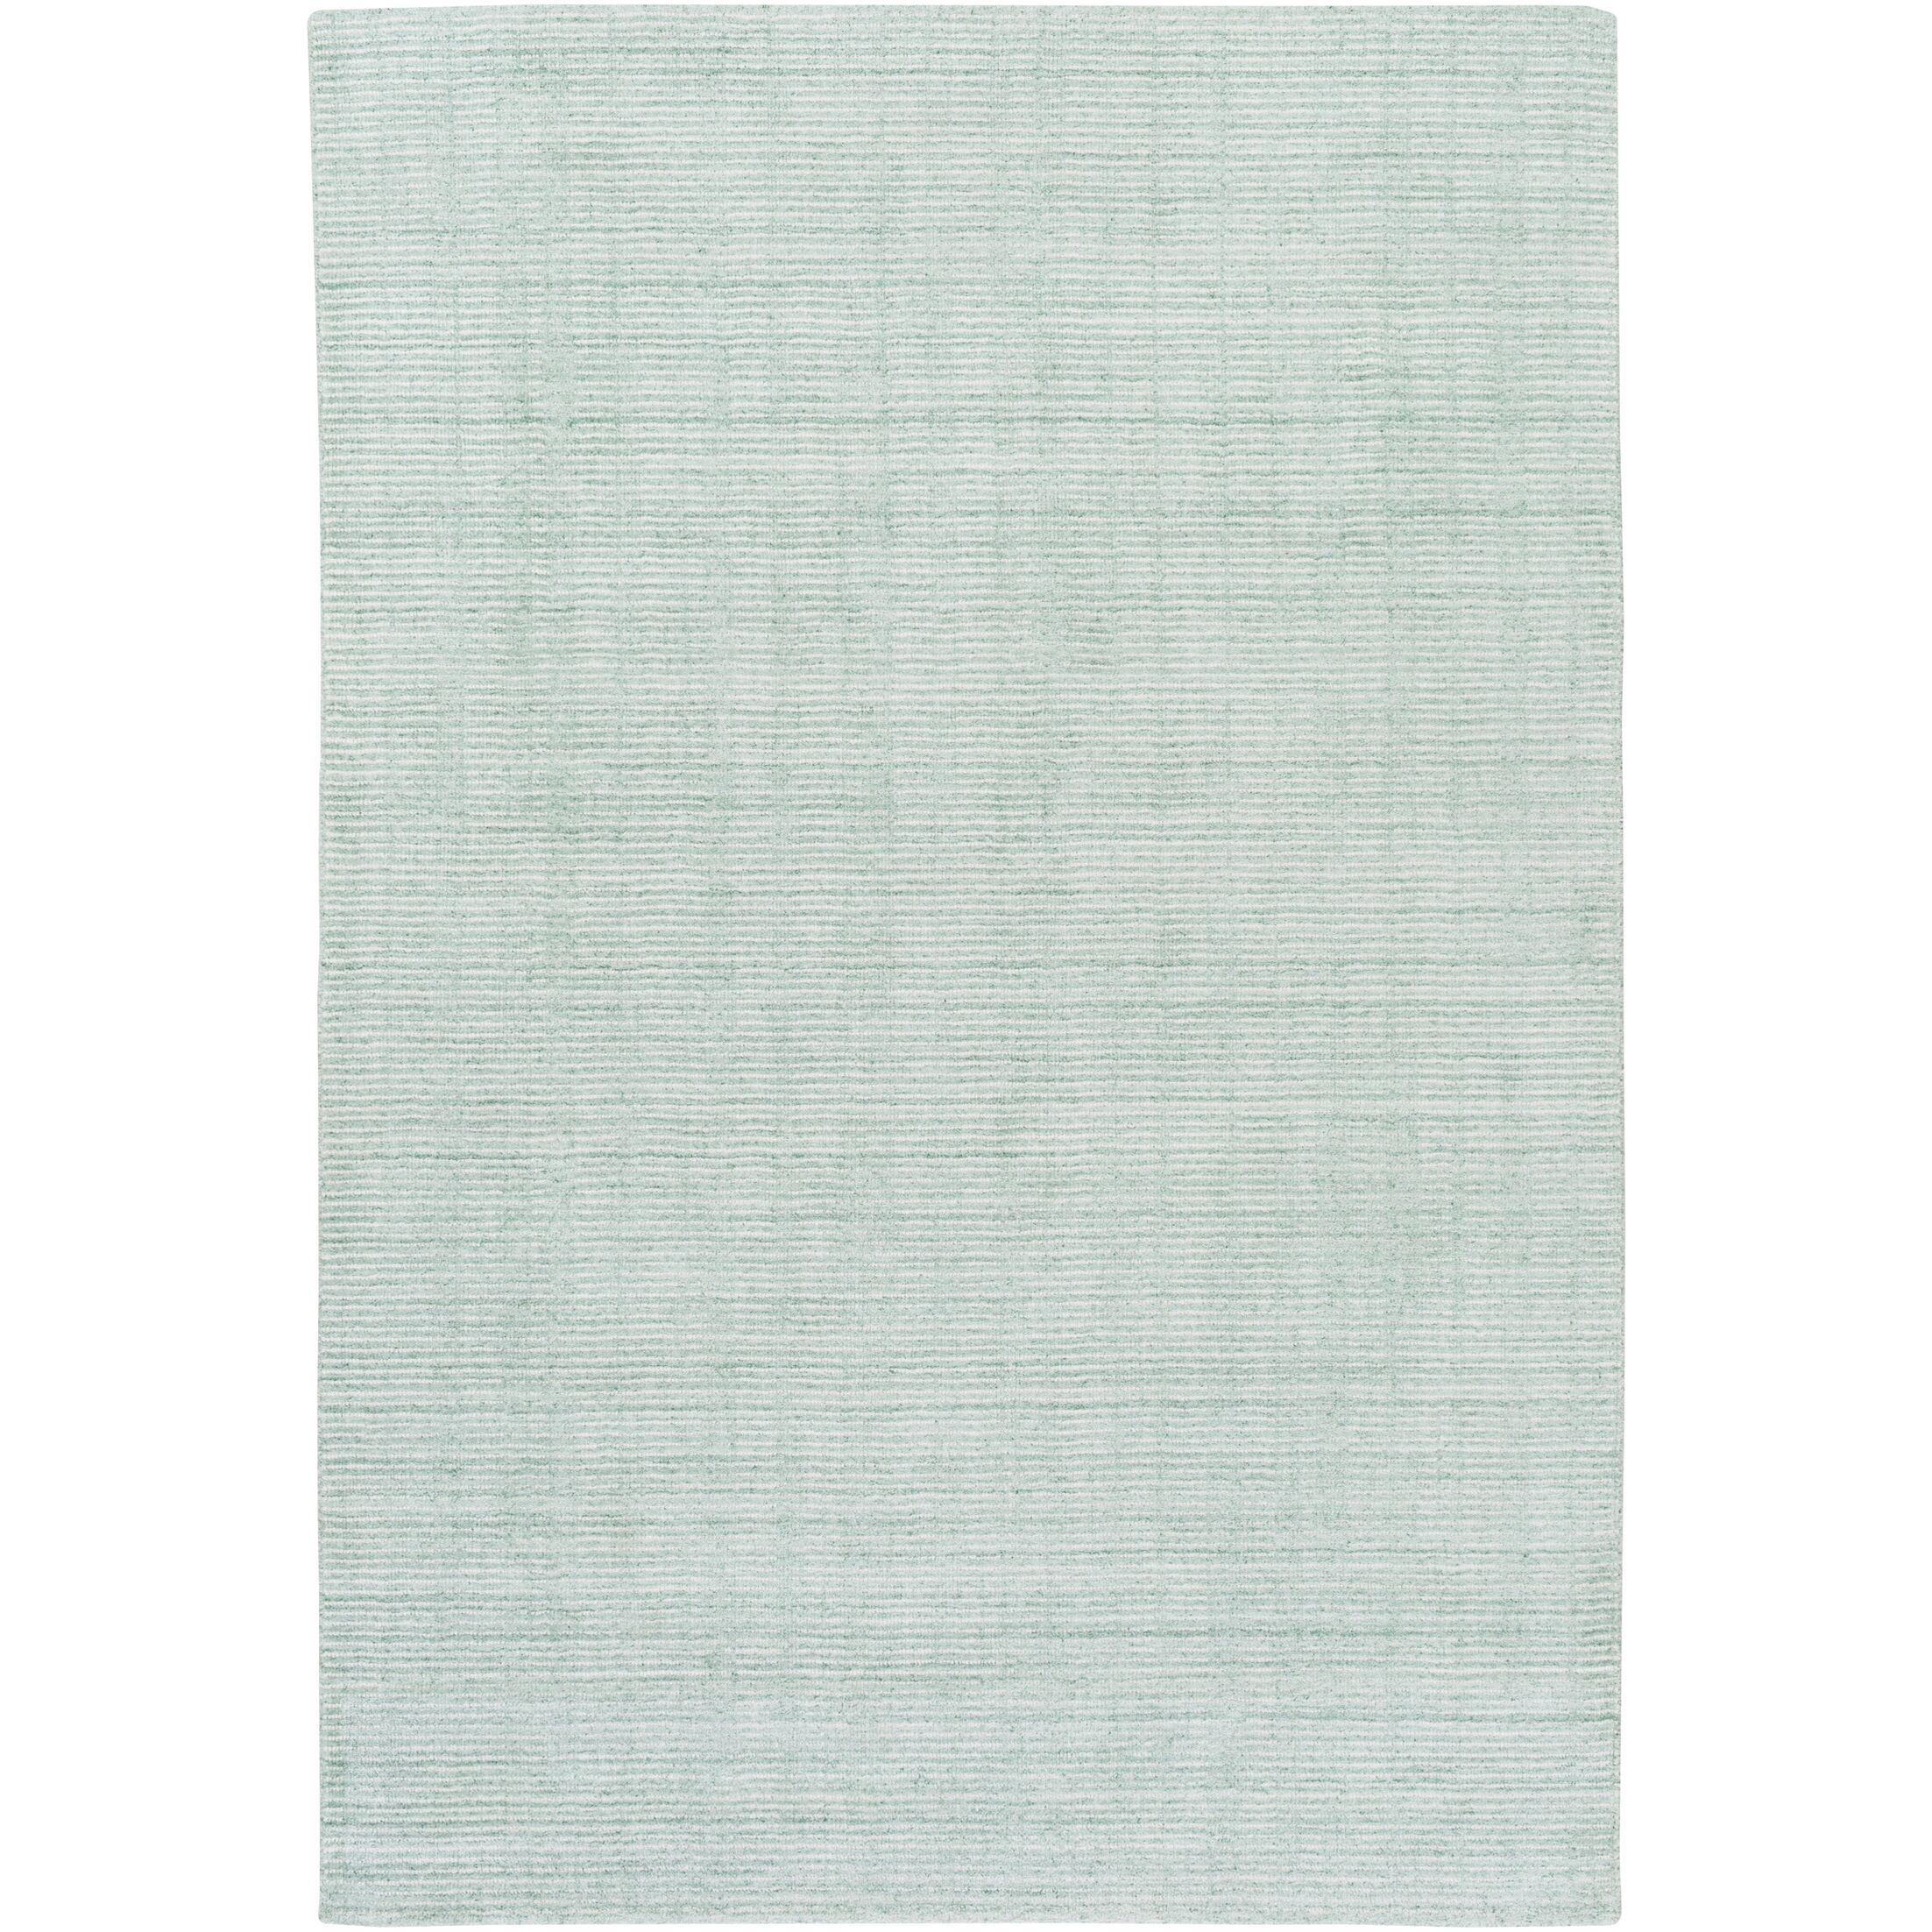 Chesterbrook Hand-Loomed Sea Foam Area Rug Rug Size: Rectangle 8' x 10'